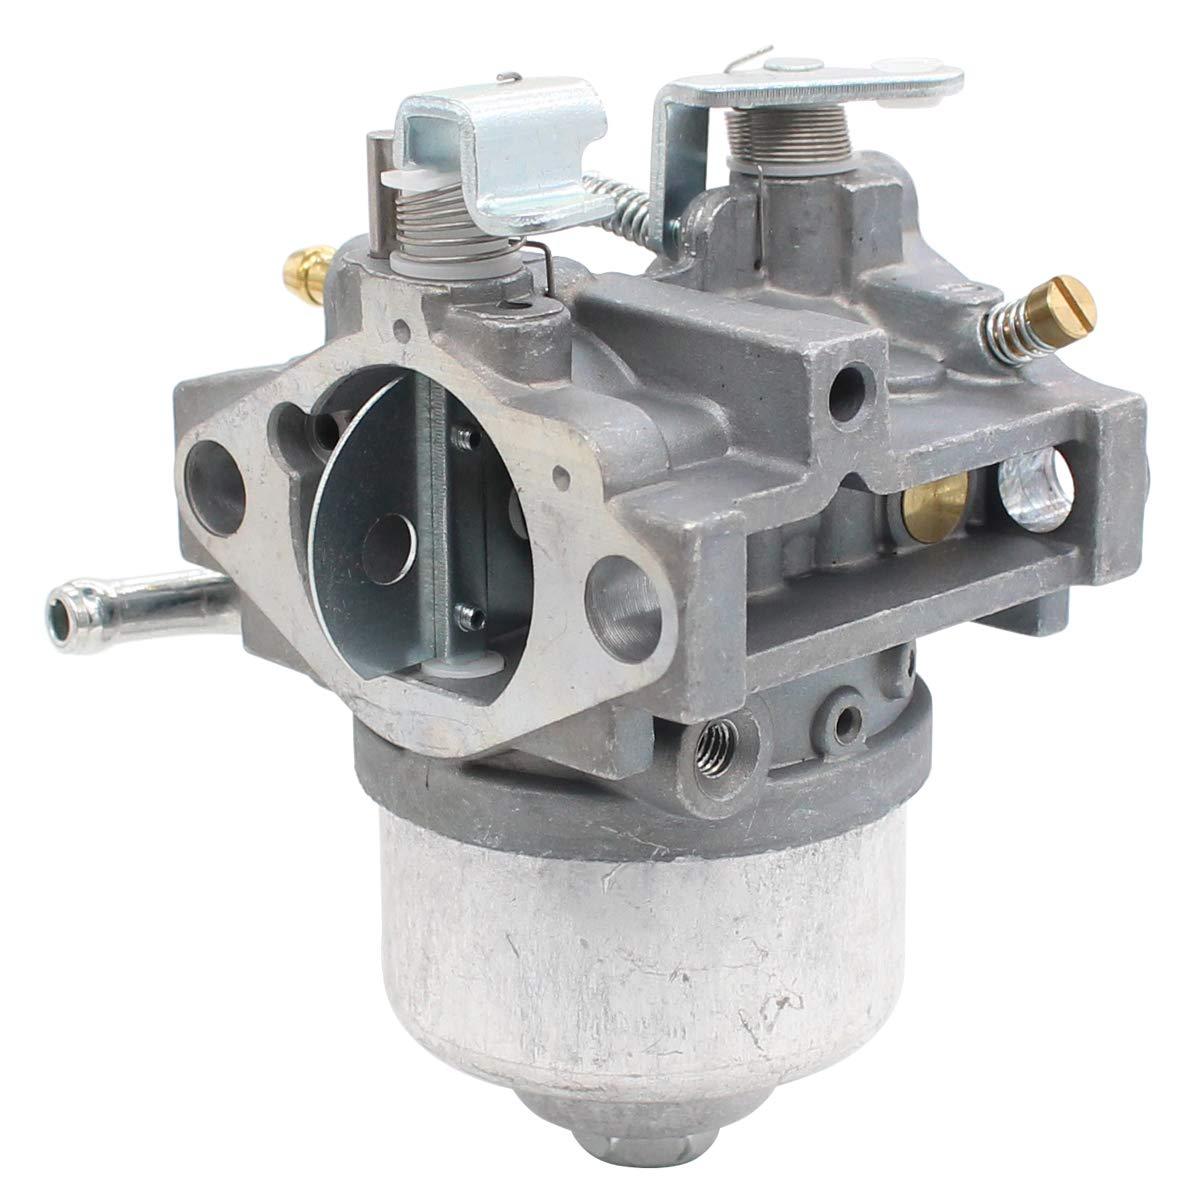 NEW CARBURETOR FIT KAWASAKI 15003-2796 Repl 15003-2777 FB460V 4 Stroke Engine US